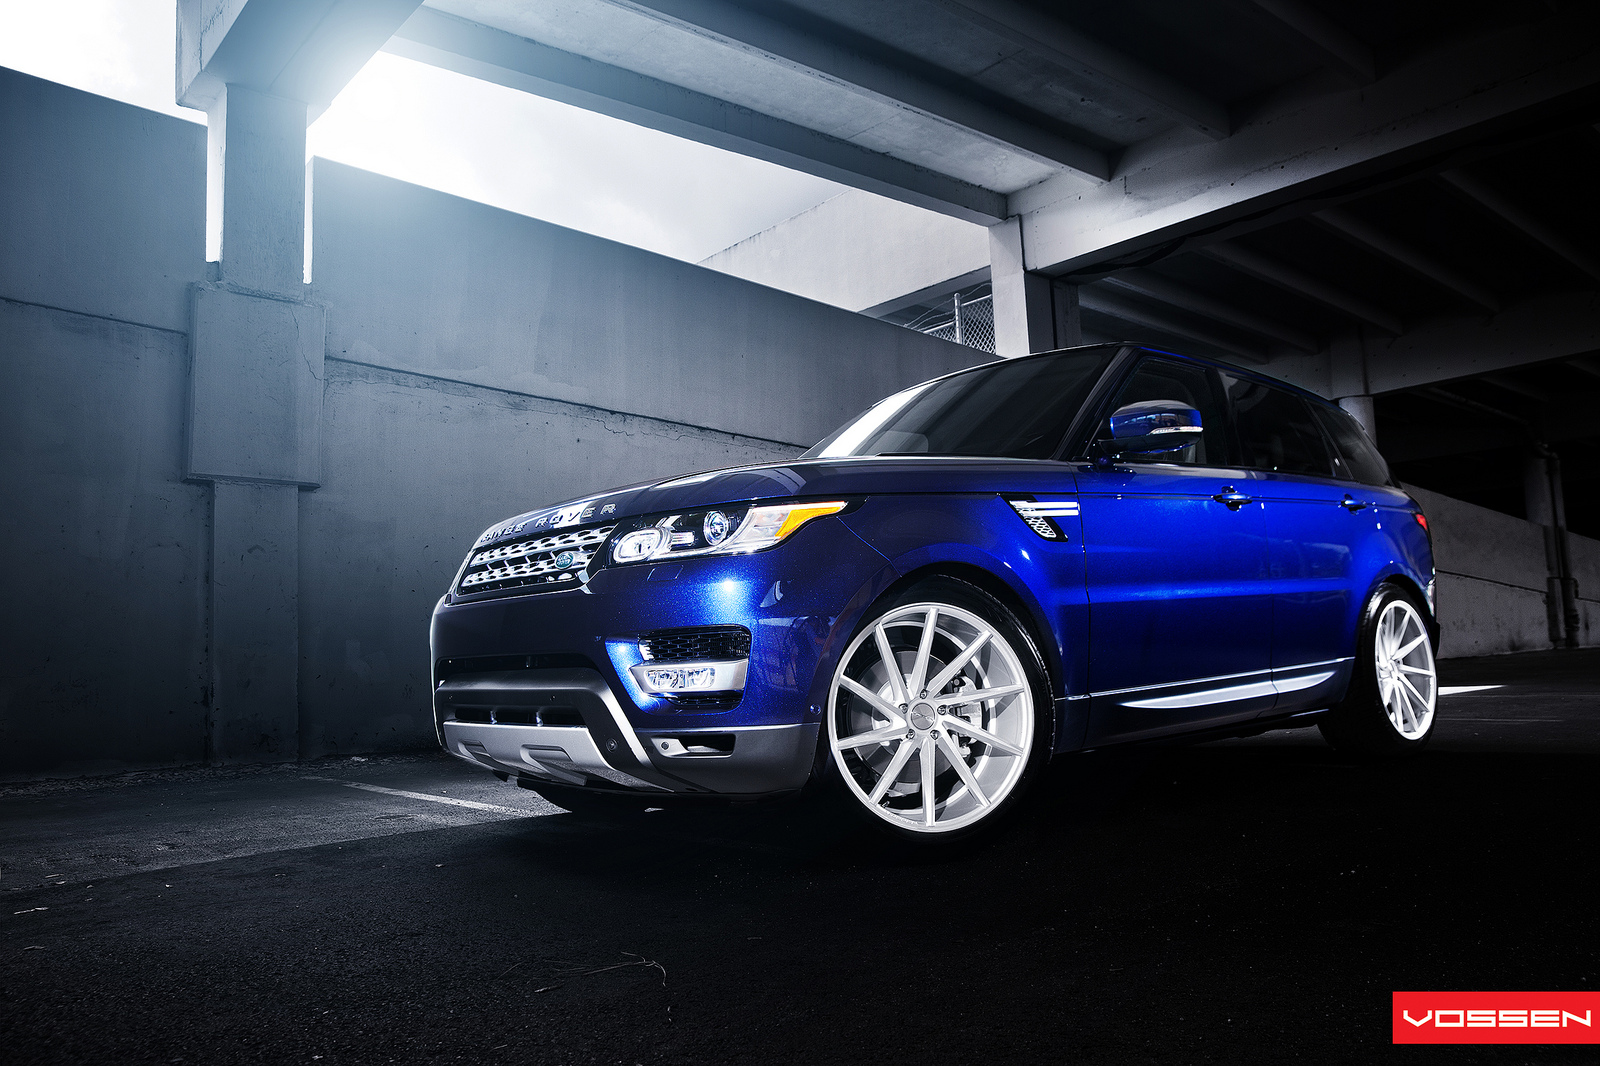 http://s1.cdn.autoevolution.com/images/news/gallery/2014-range-rover-sport-gets-22-inch-vossen-cvt-wheels-video-photo-gallery_4.jpg?1385198190